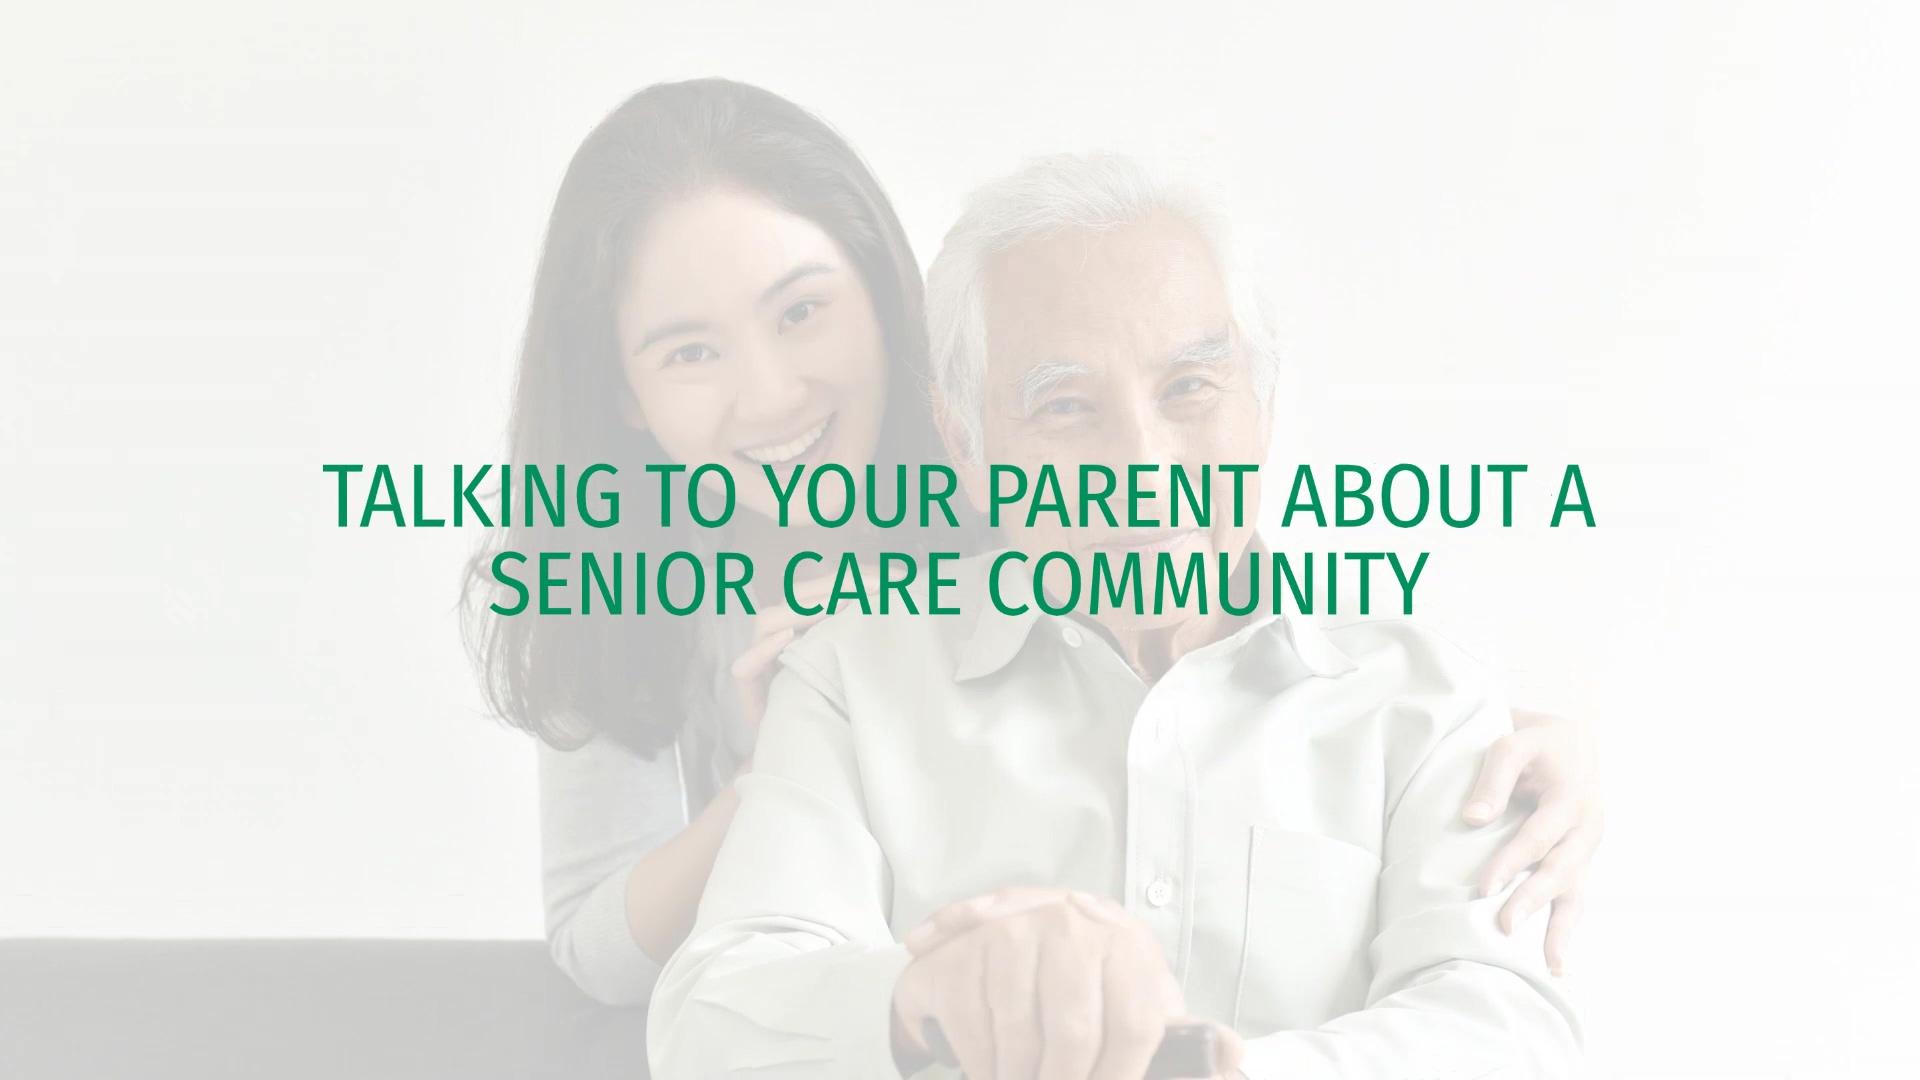 Cedarhurst_TALKING TO YOUR PARENT ABOUT A SENIOR CARE COMMUNITY_Video